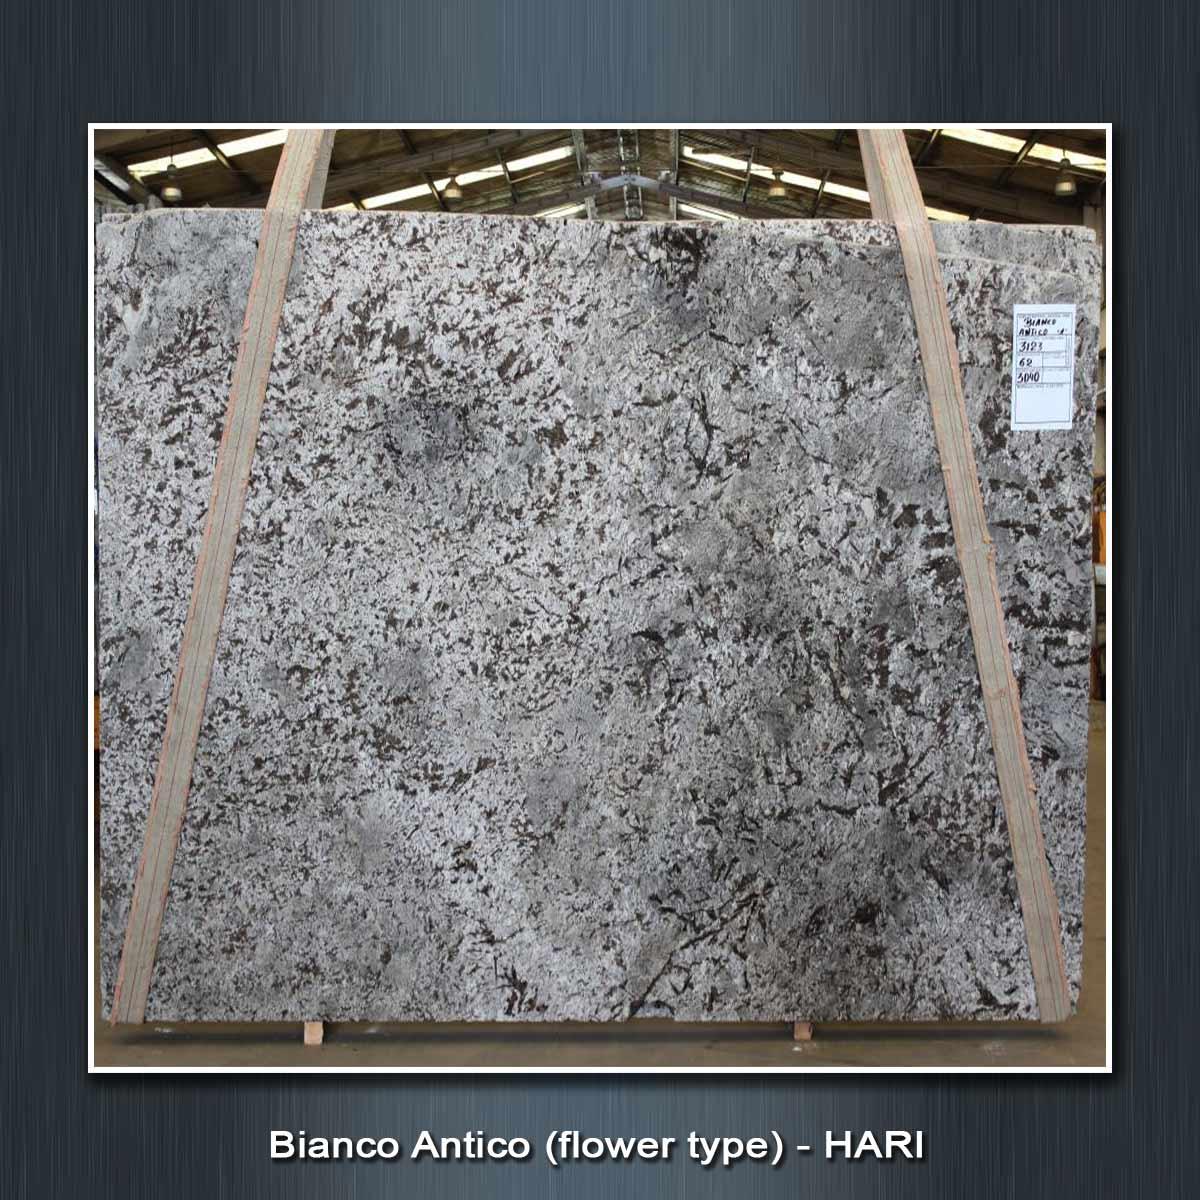 Bianco Antico (flower-type)